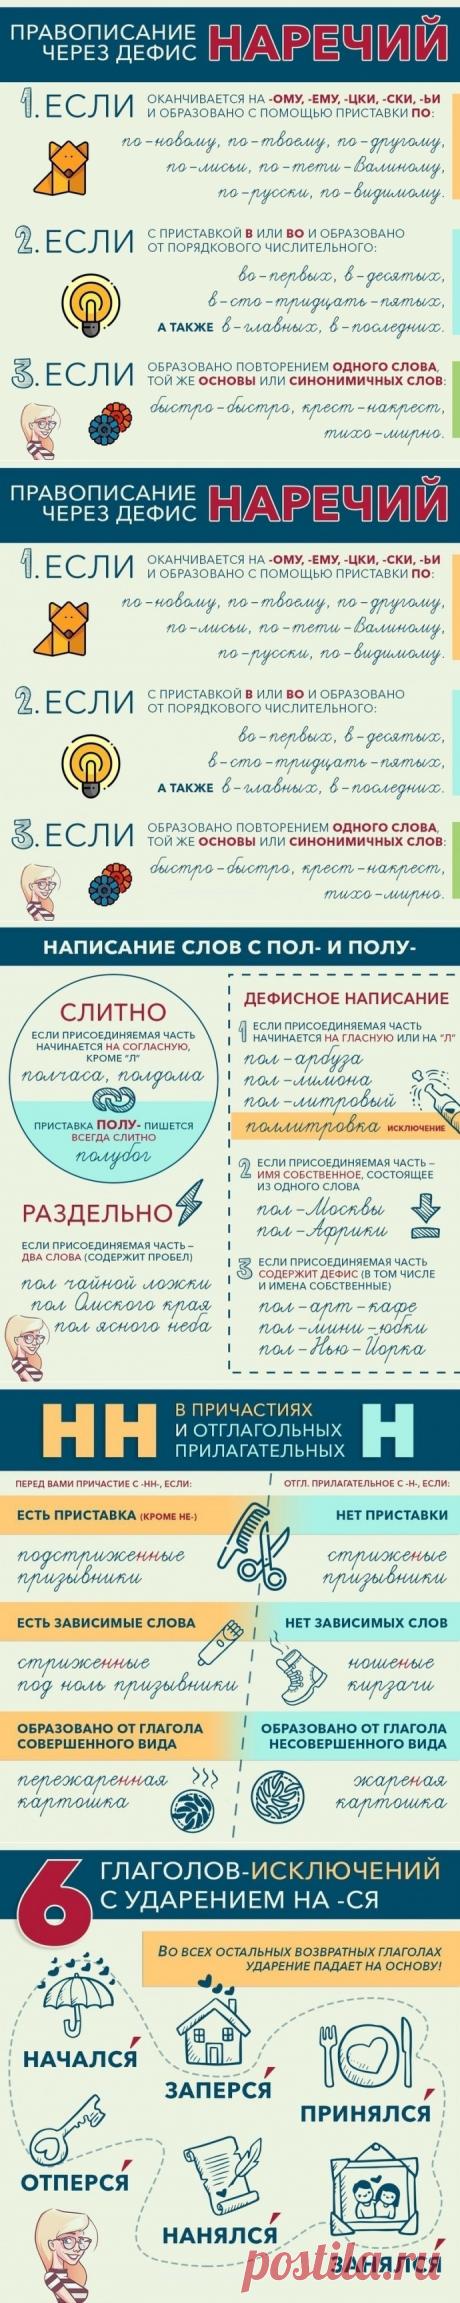 Замечательная шпаргалка по русскому языку